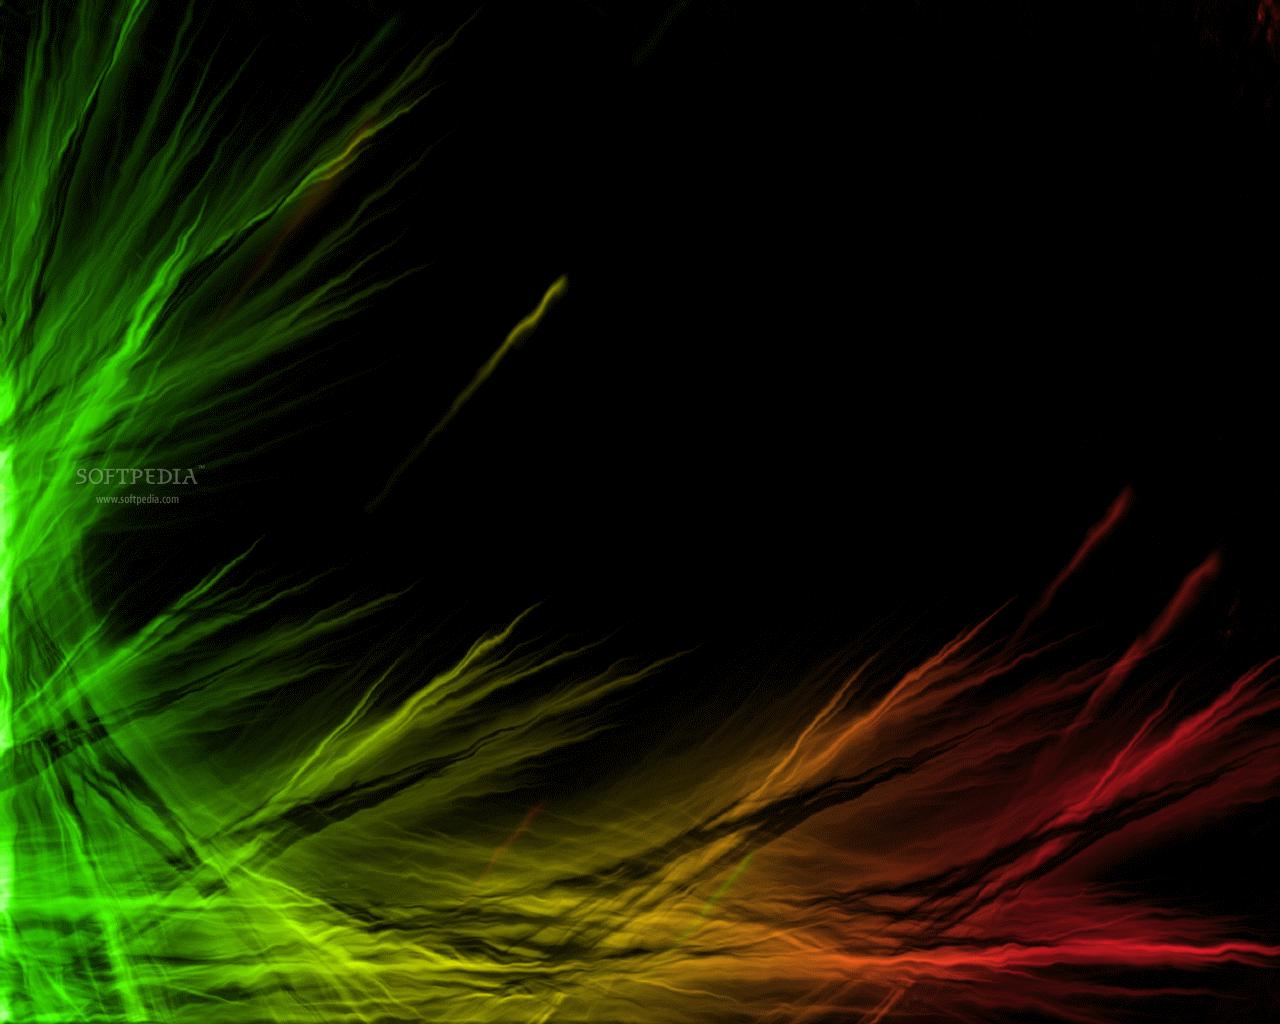 Reggae background google zoeken bheroxc111 reggae psychedelic art dan desktop - Reggae girl wallpaper ...